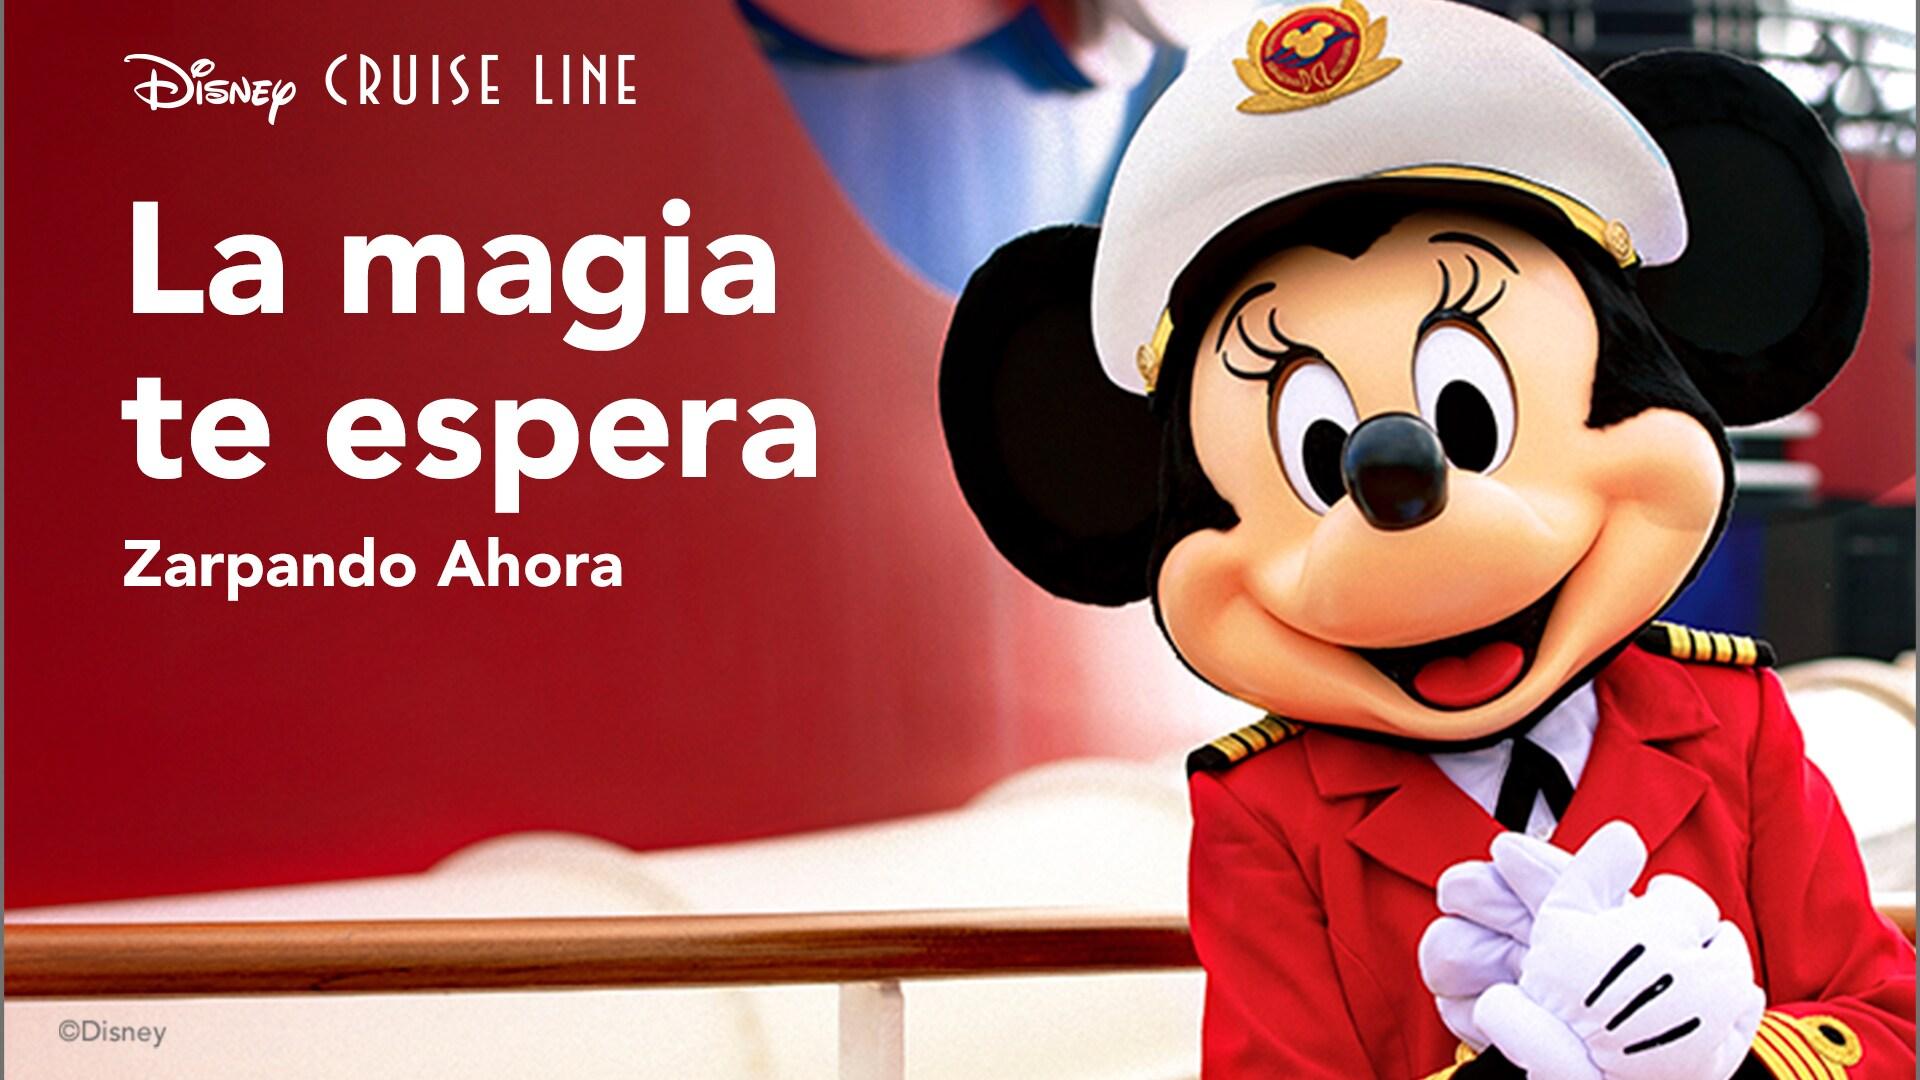 La magia te espera con Disney Cruise Line